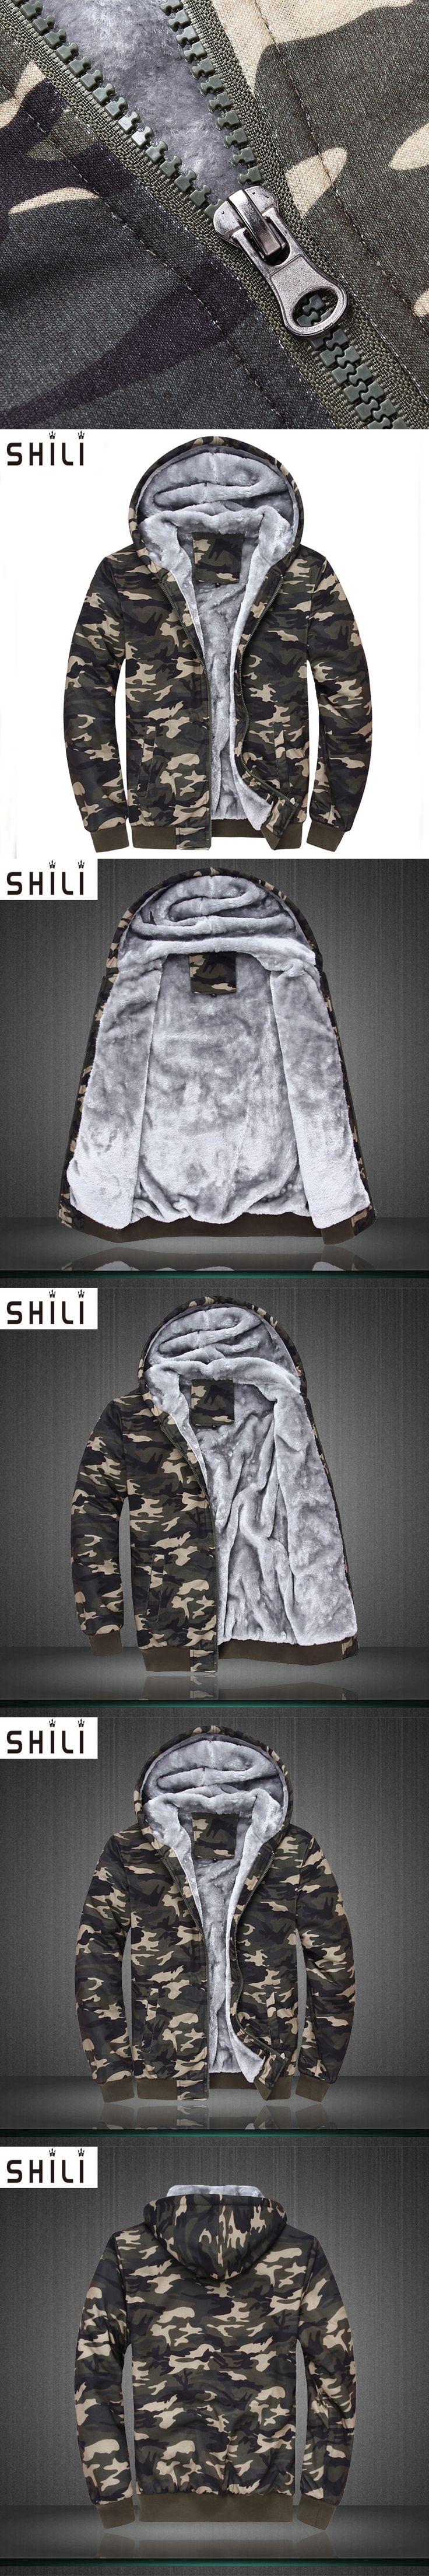 2017 Autumn and winter New Thick Velvet Men Hoodies Cotton Plus Size Zip-up Coat Long Sleeve Cashmere Warm Hoodies Basic Jackets